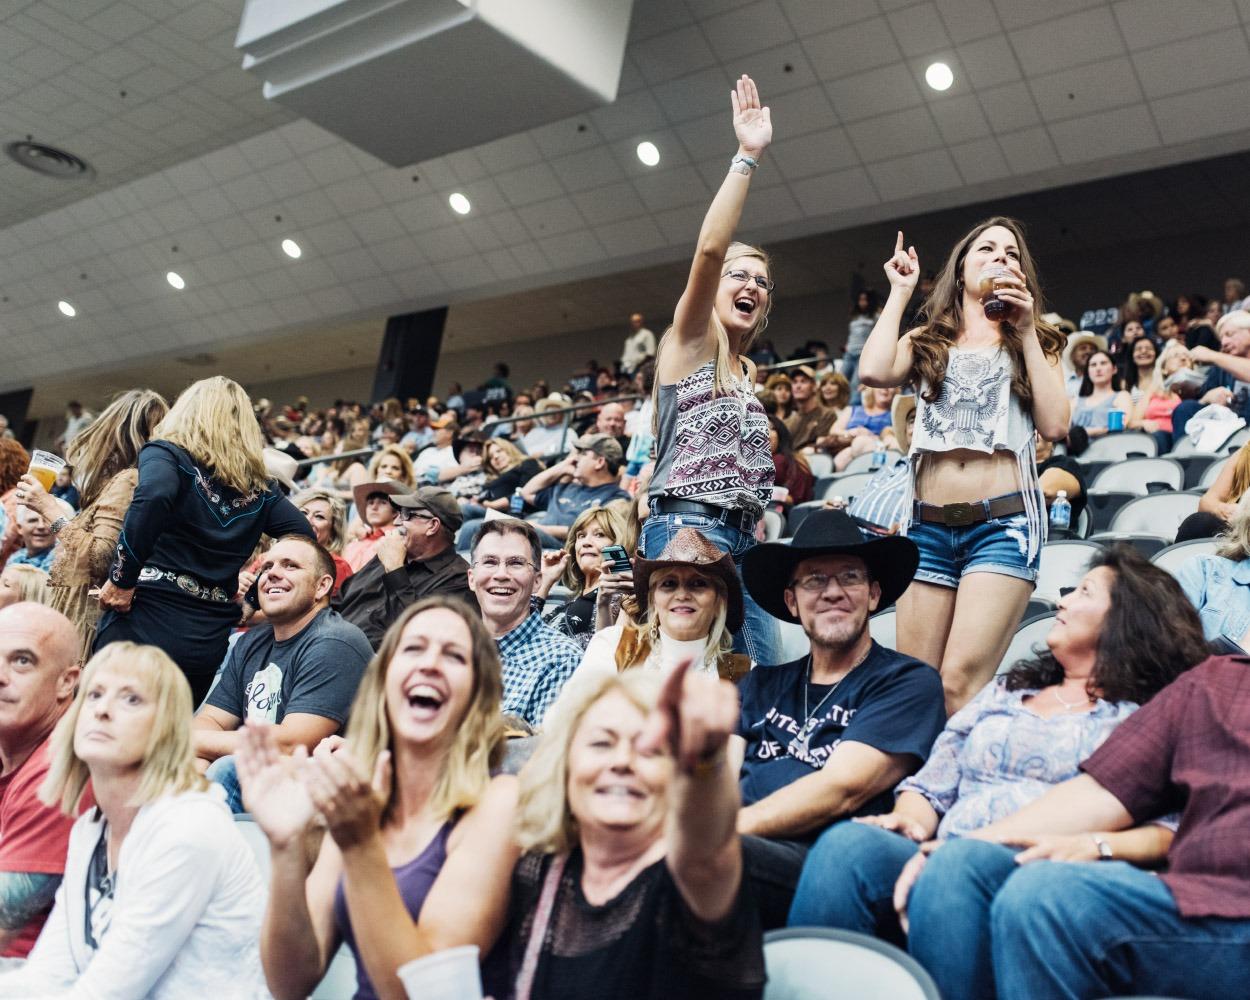 The crowd at the Tucson Convention Center, Tucson, Arizona, Saturday, October, 3